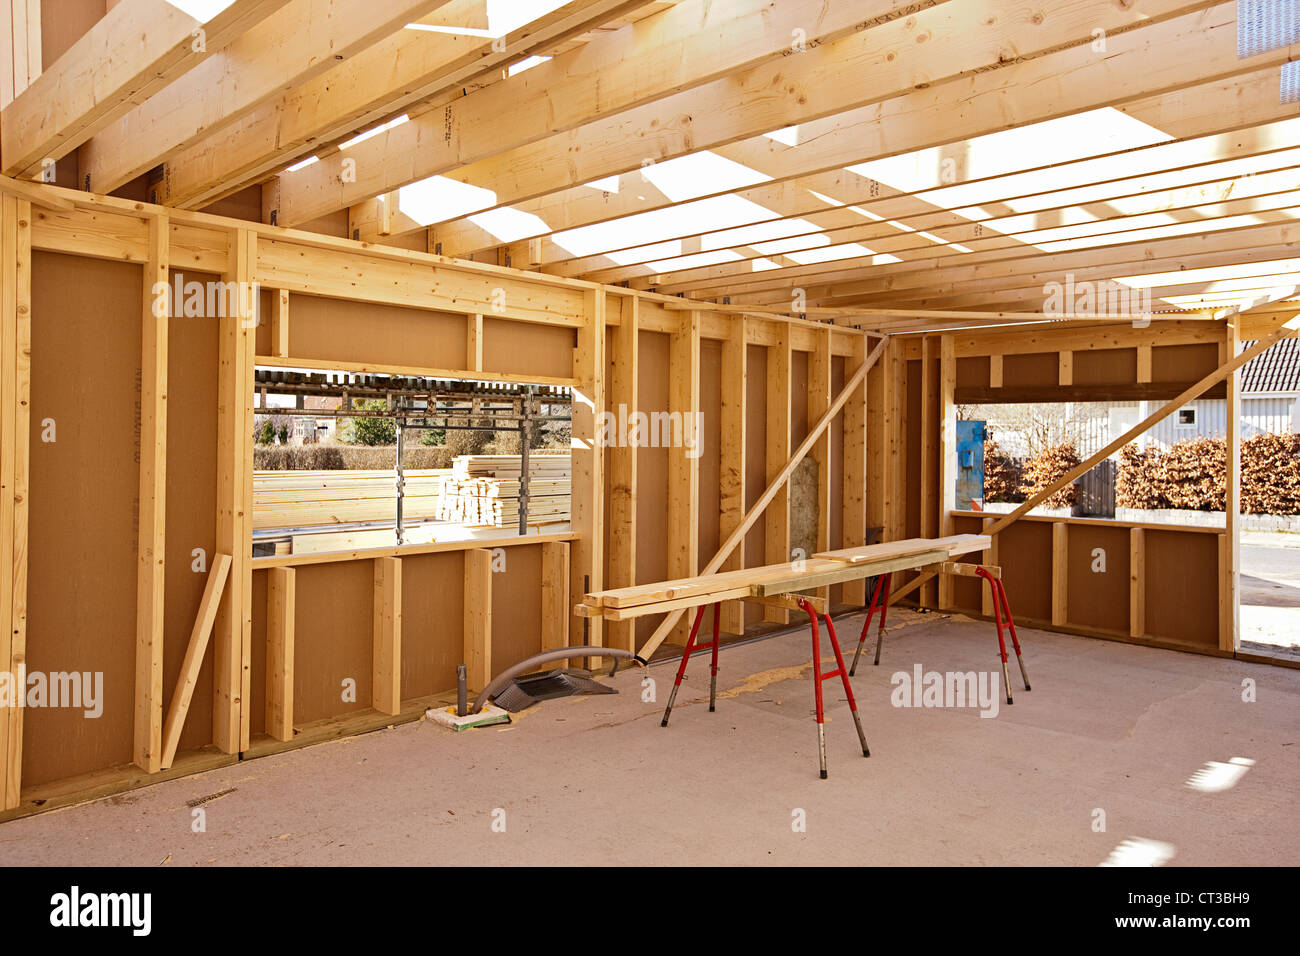 Building Wood Framing Under Construction Stockfotos & Building Wood ...